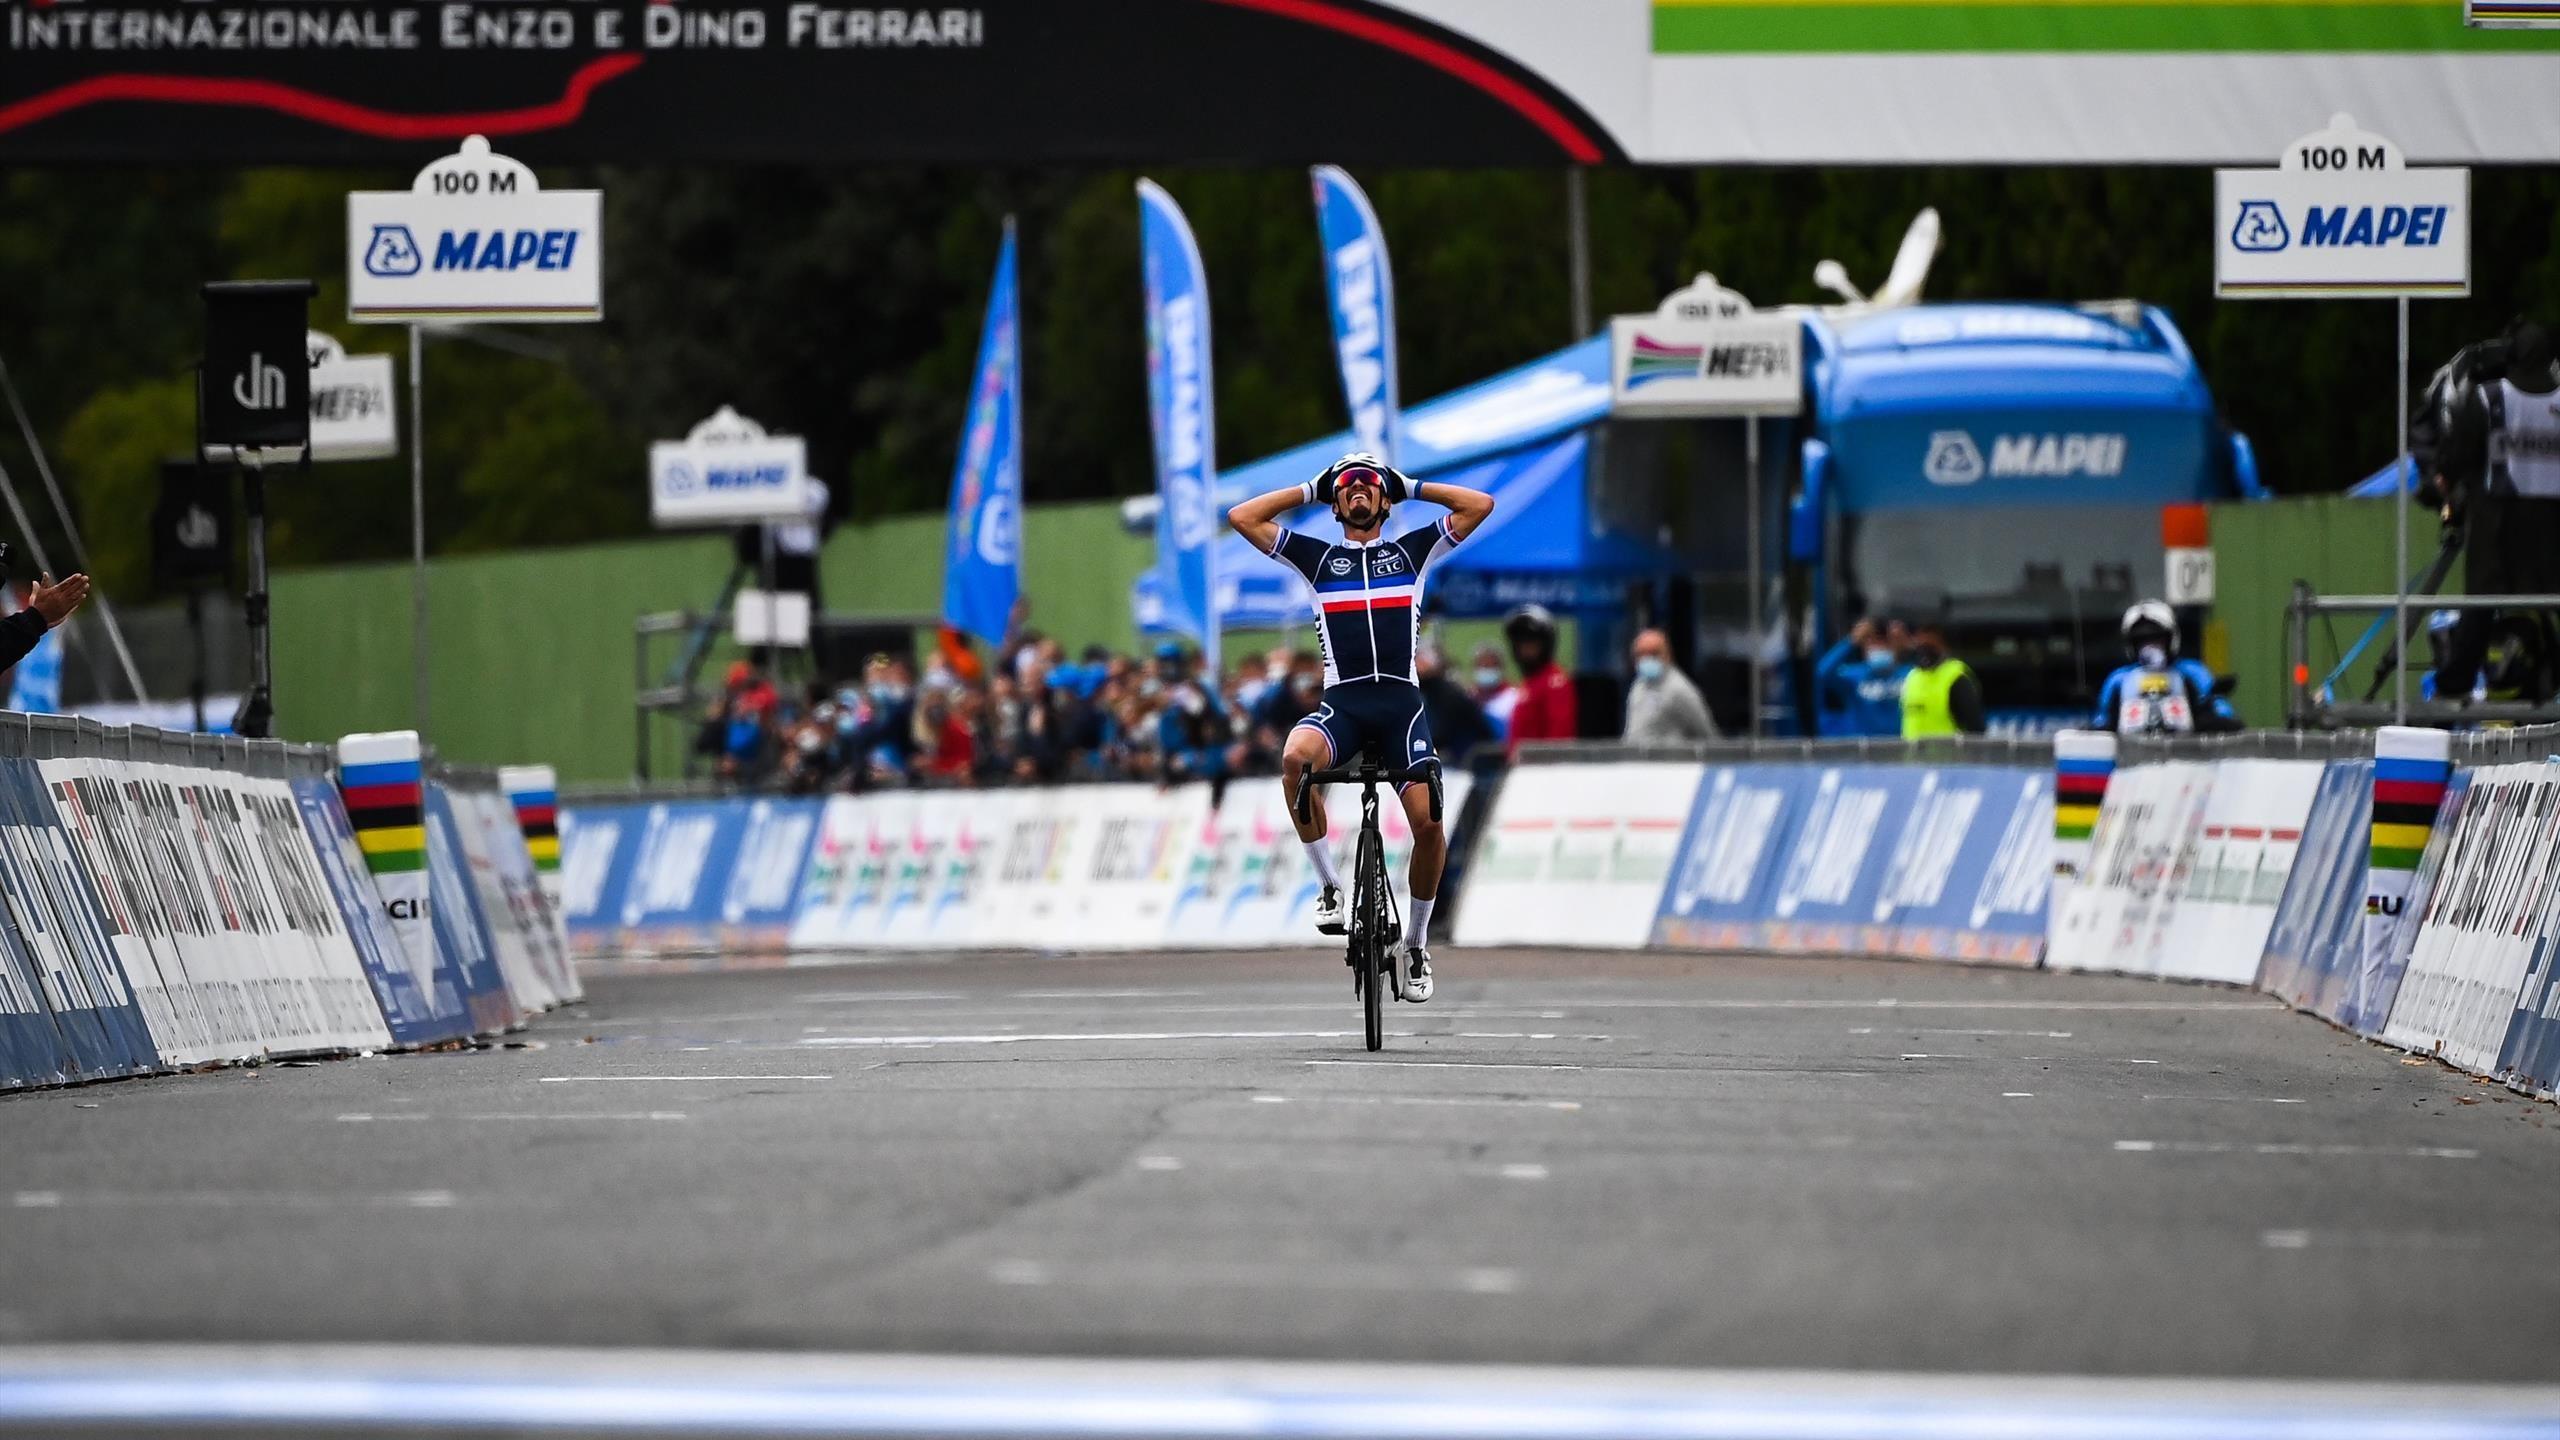 world championship road race betting odds